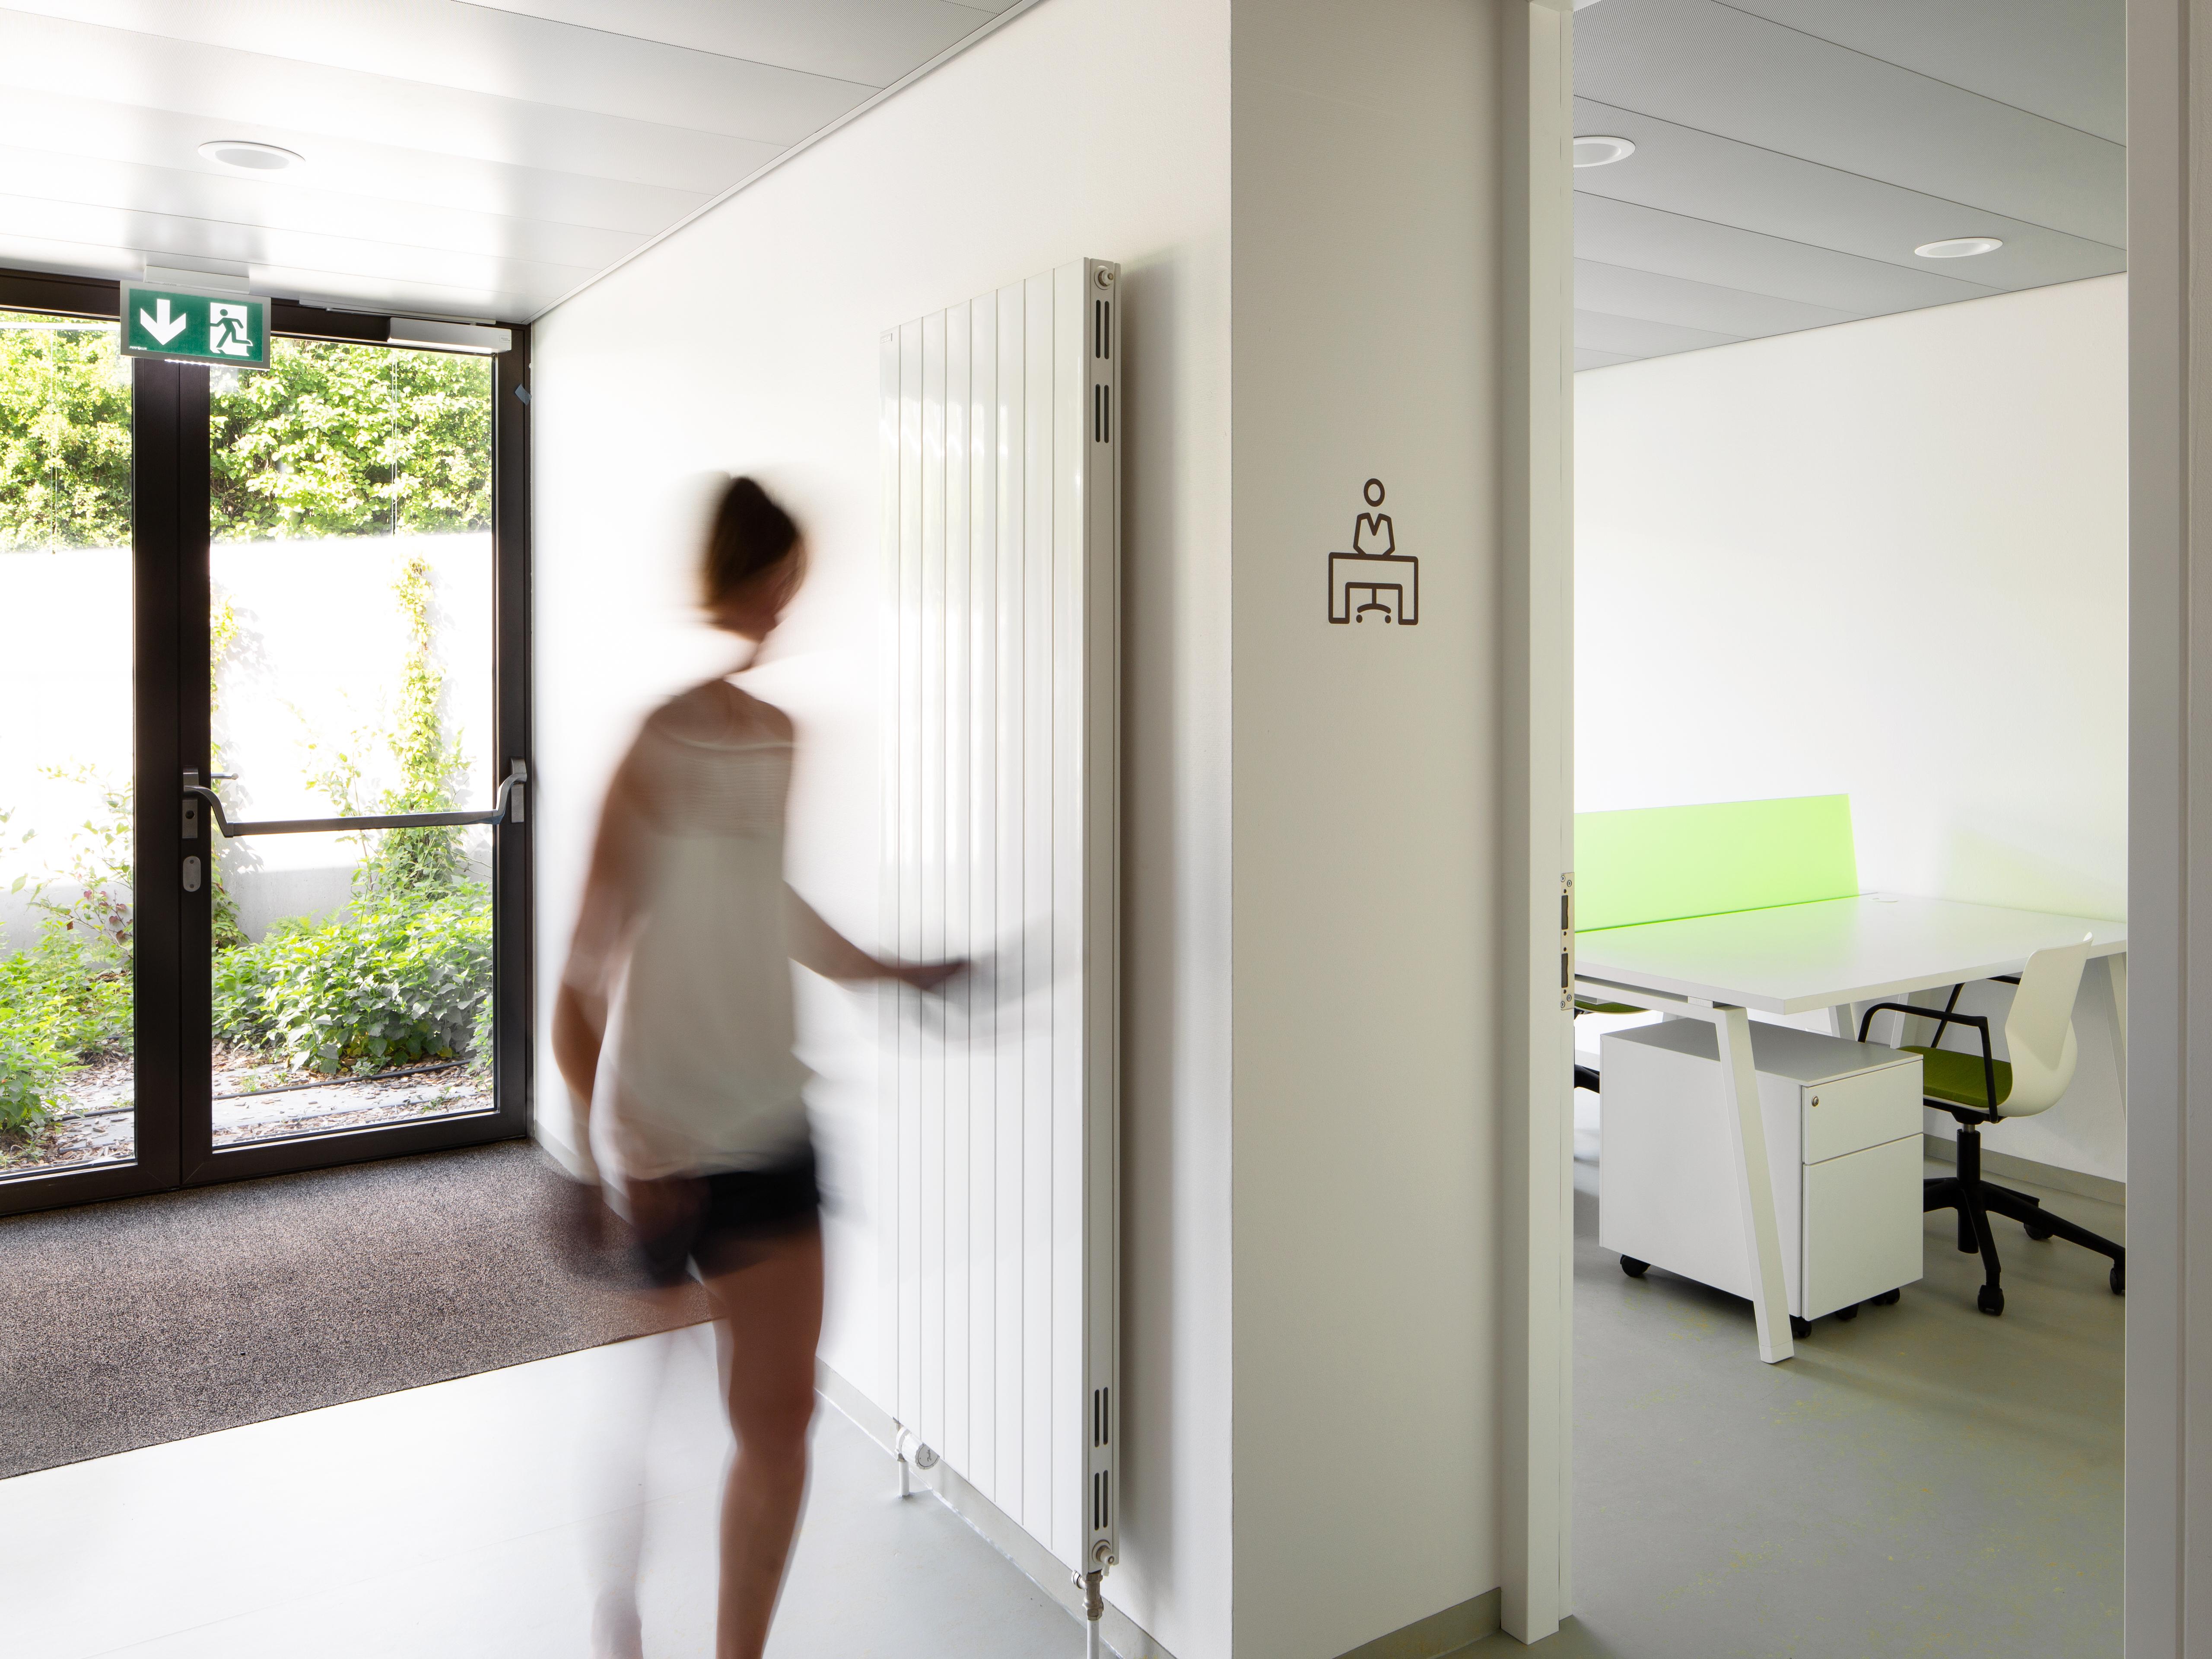 Architecte Cantine – Uapeamp; Lonay Sennwald Designer dhrxsQCtBo